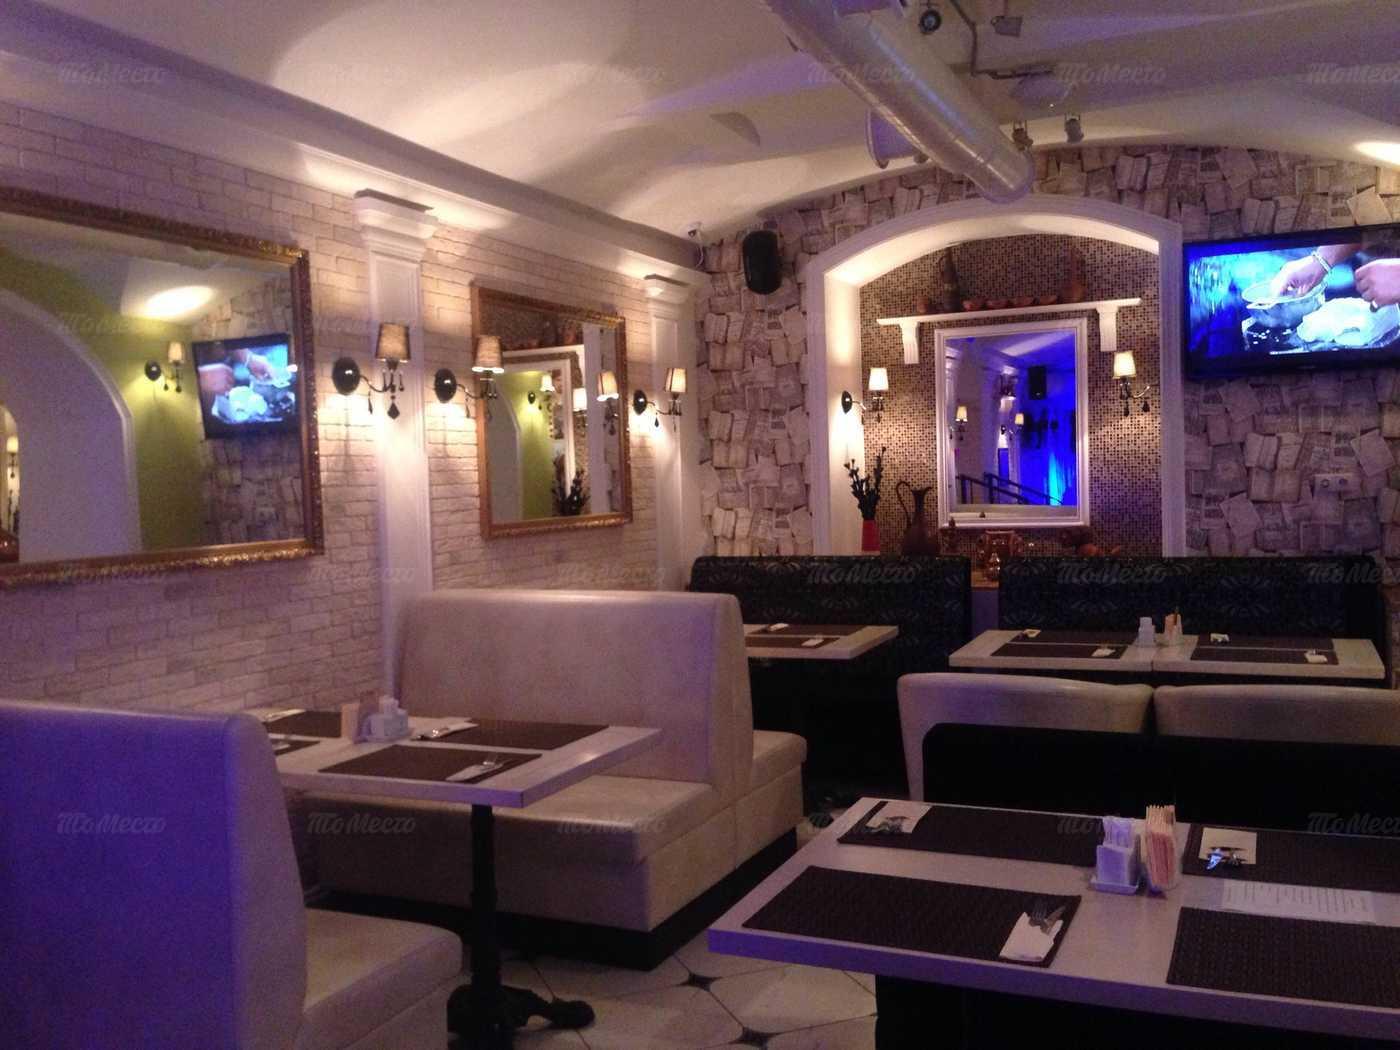 Меню ресторана Кин-Дза-Дза на Мясницкой улице